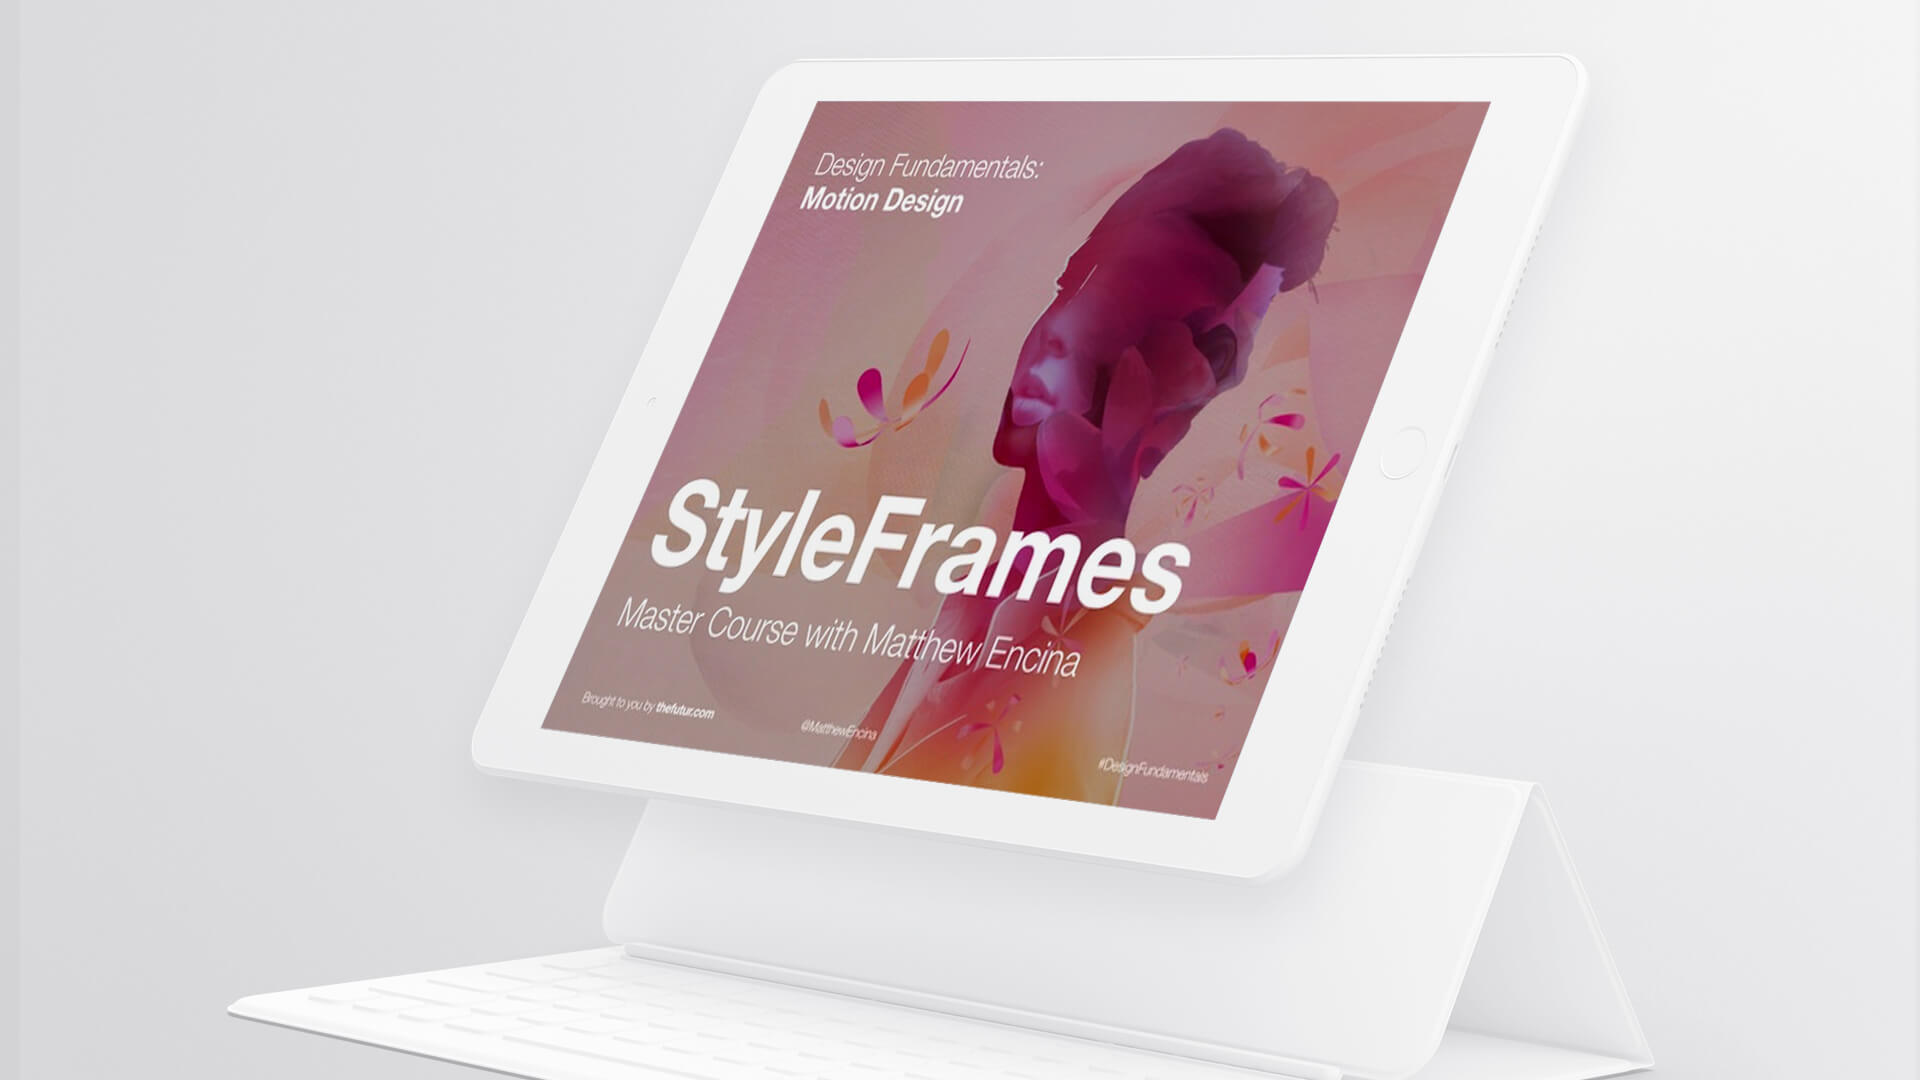 Styleframes